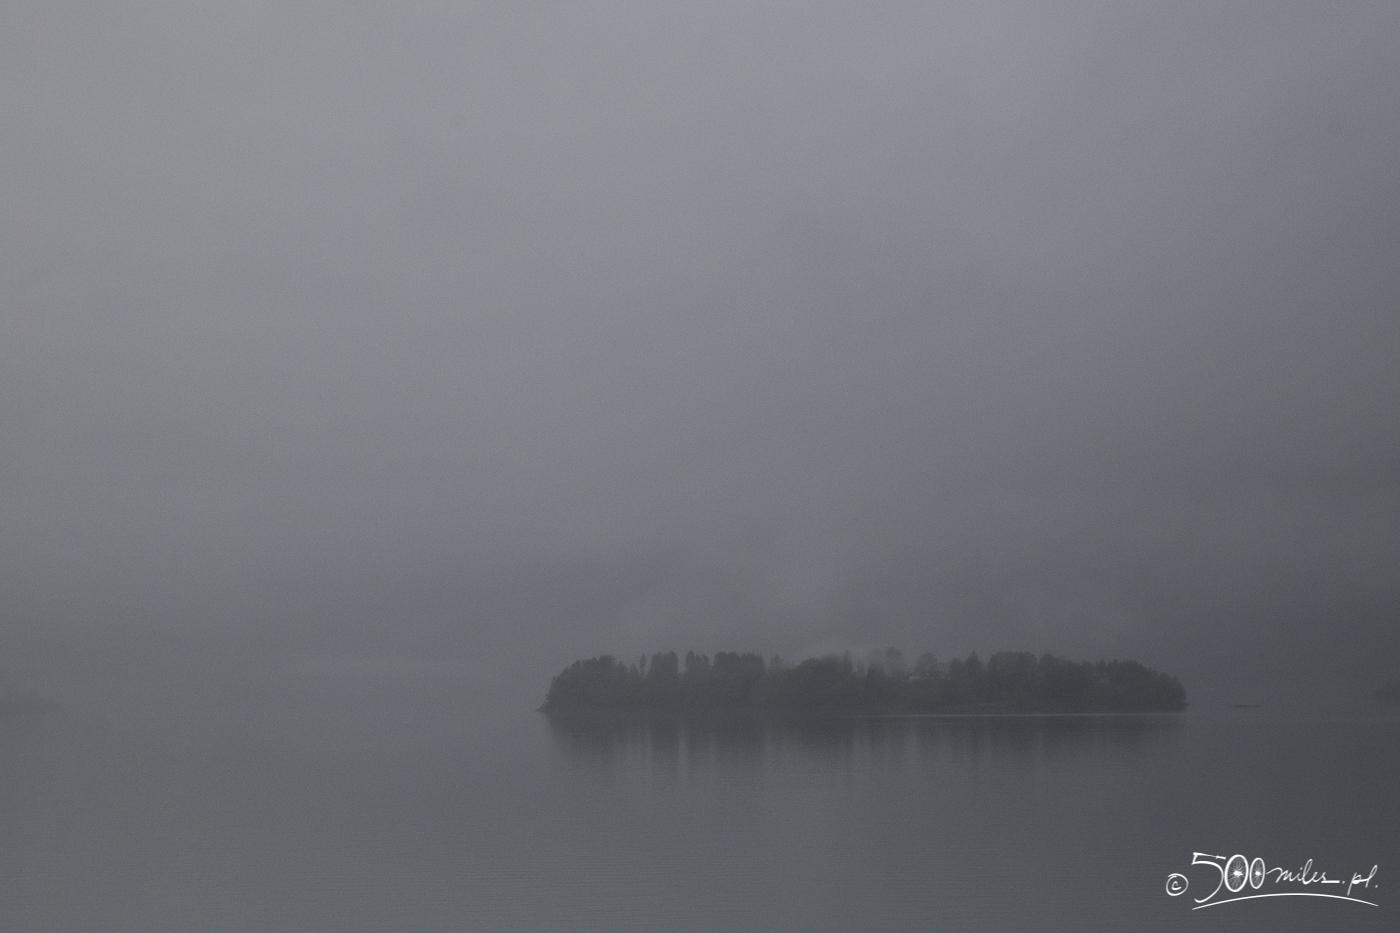 Oslo-Bergen train ride - incredibly foggy moment